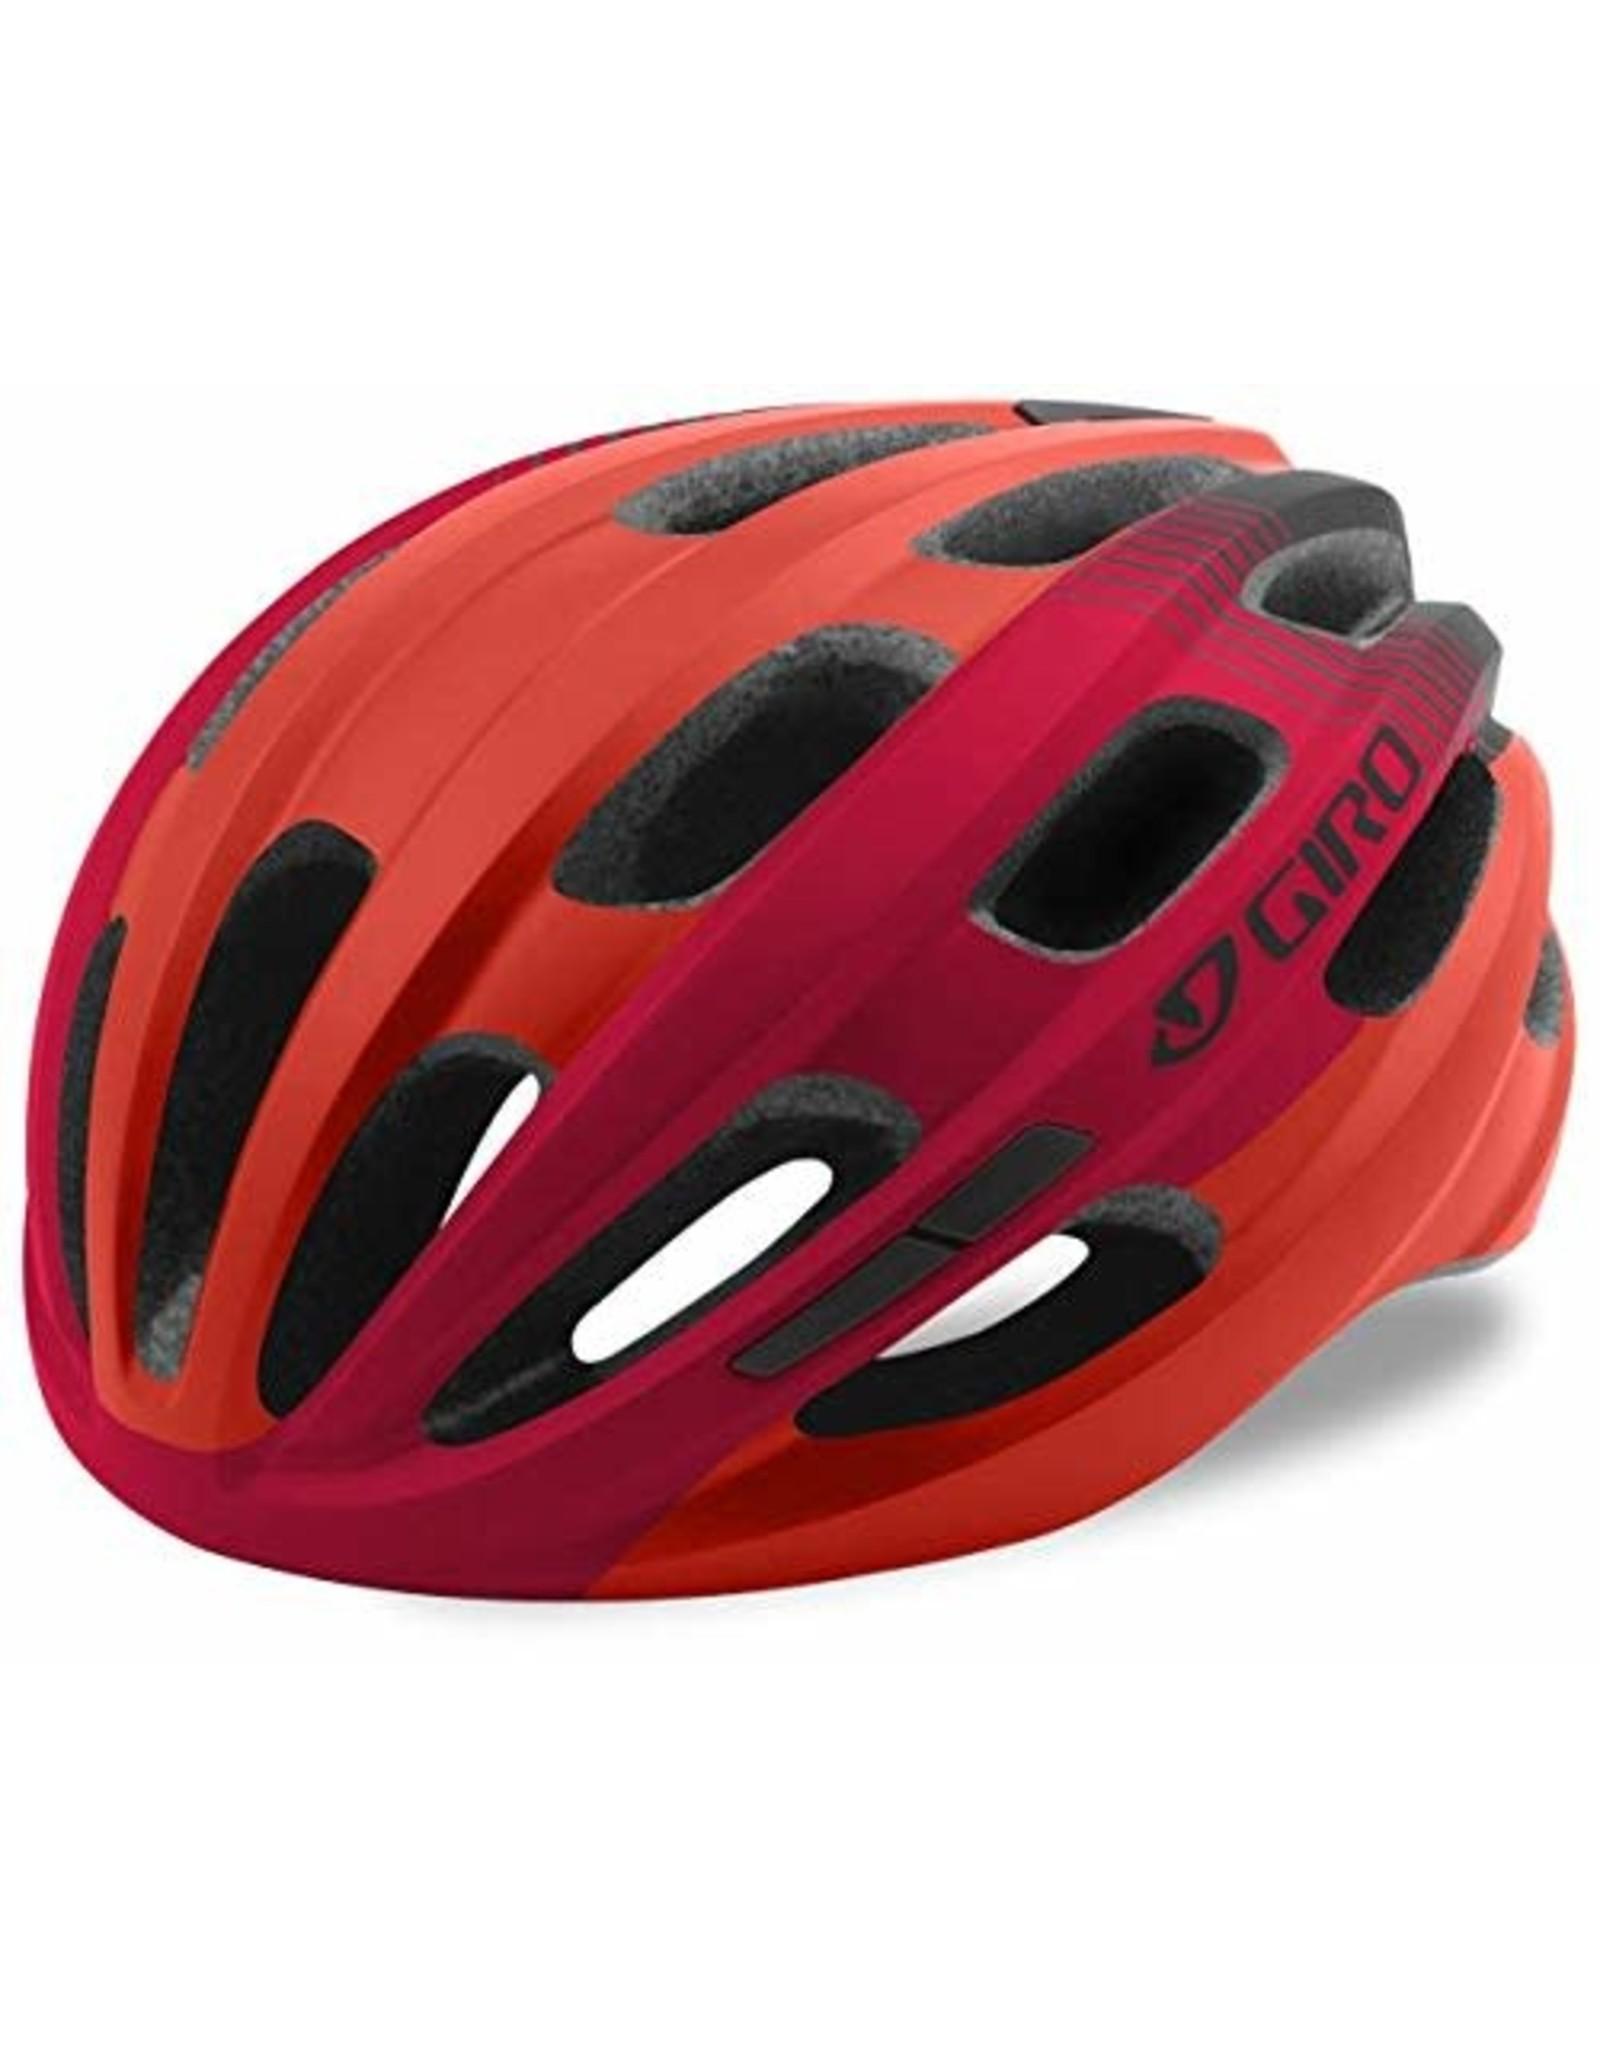 Giro Cycling Giro Isode MIPS Adult Recreational Bike Helmet - Matte Red/Black - Size UA (54-61 cm)